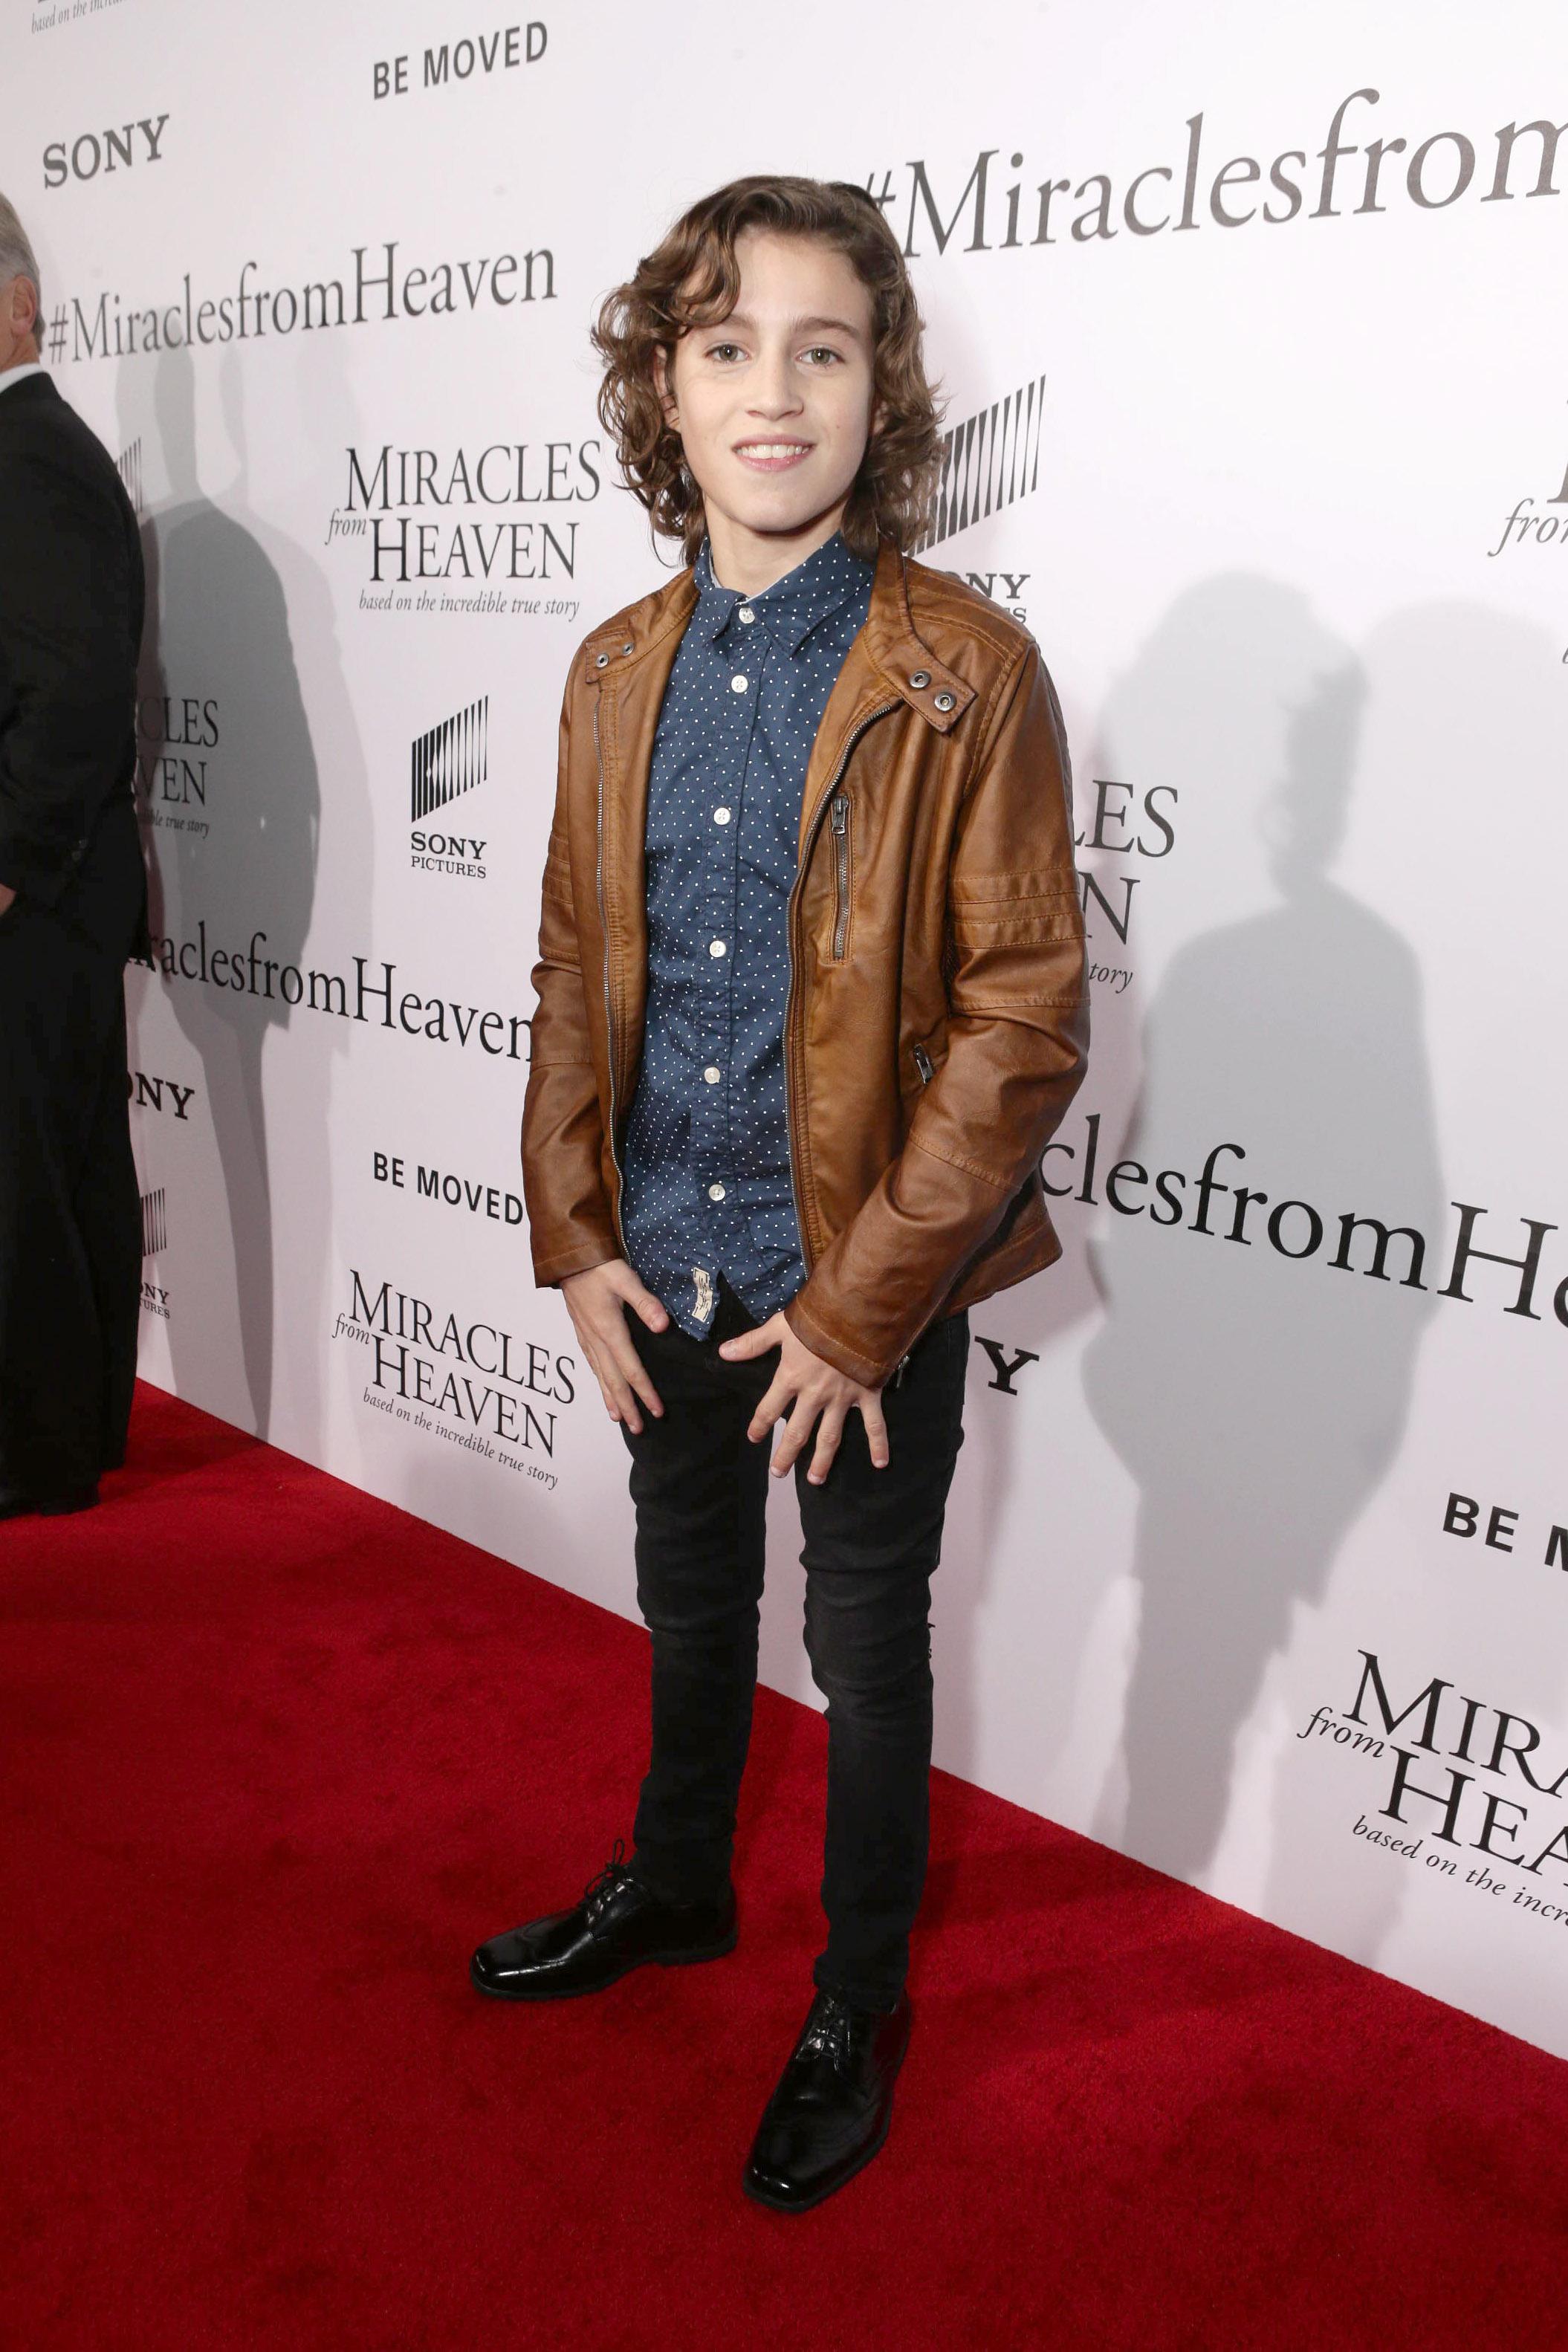 Child Stars Rock Red Carpet Style